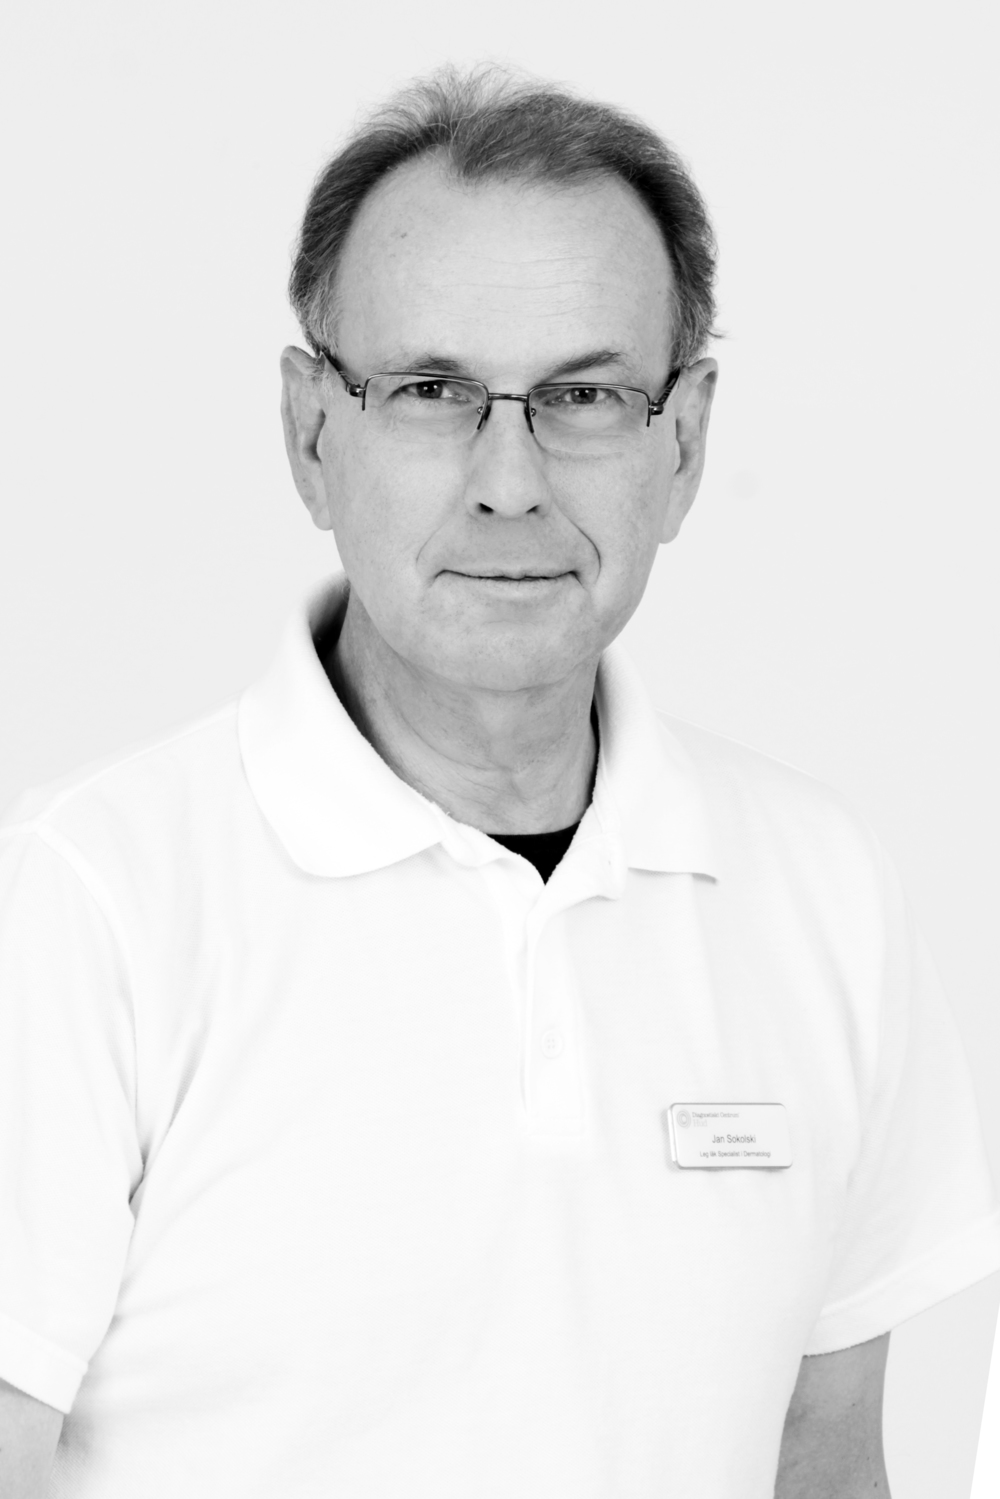 Jan Sokolski Hudläkare - Specialist i Dermatologi